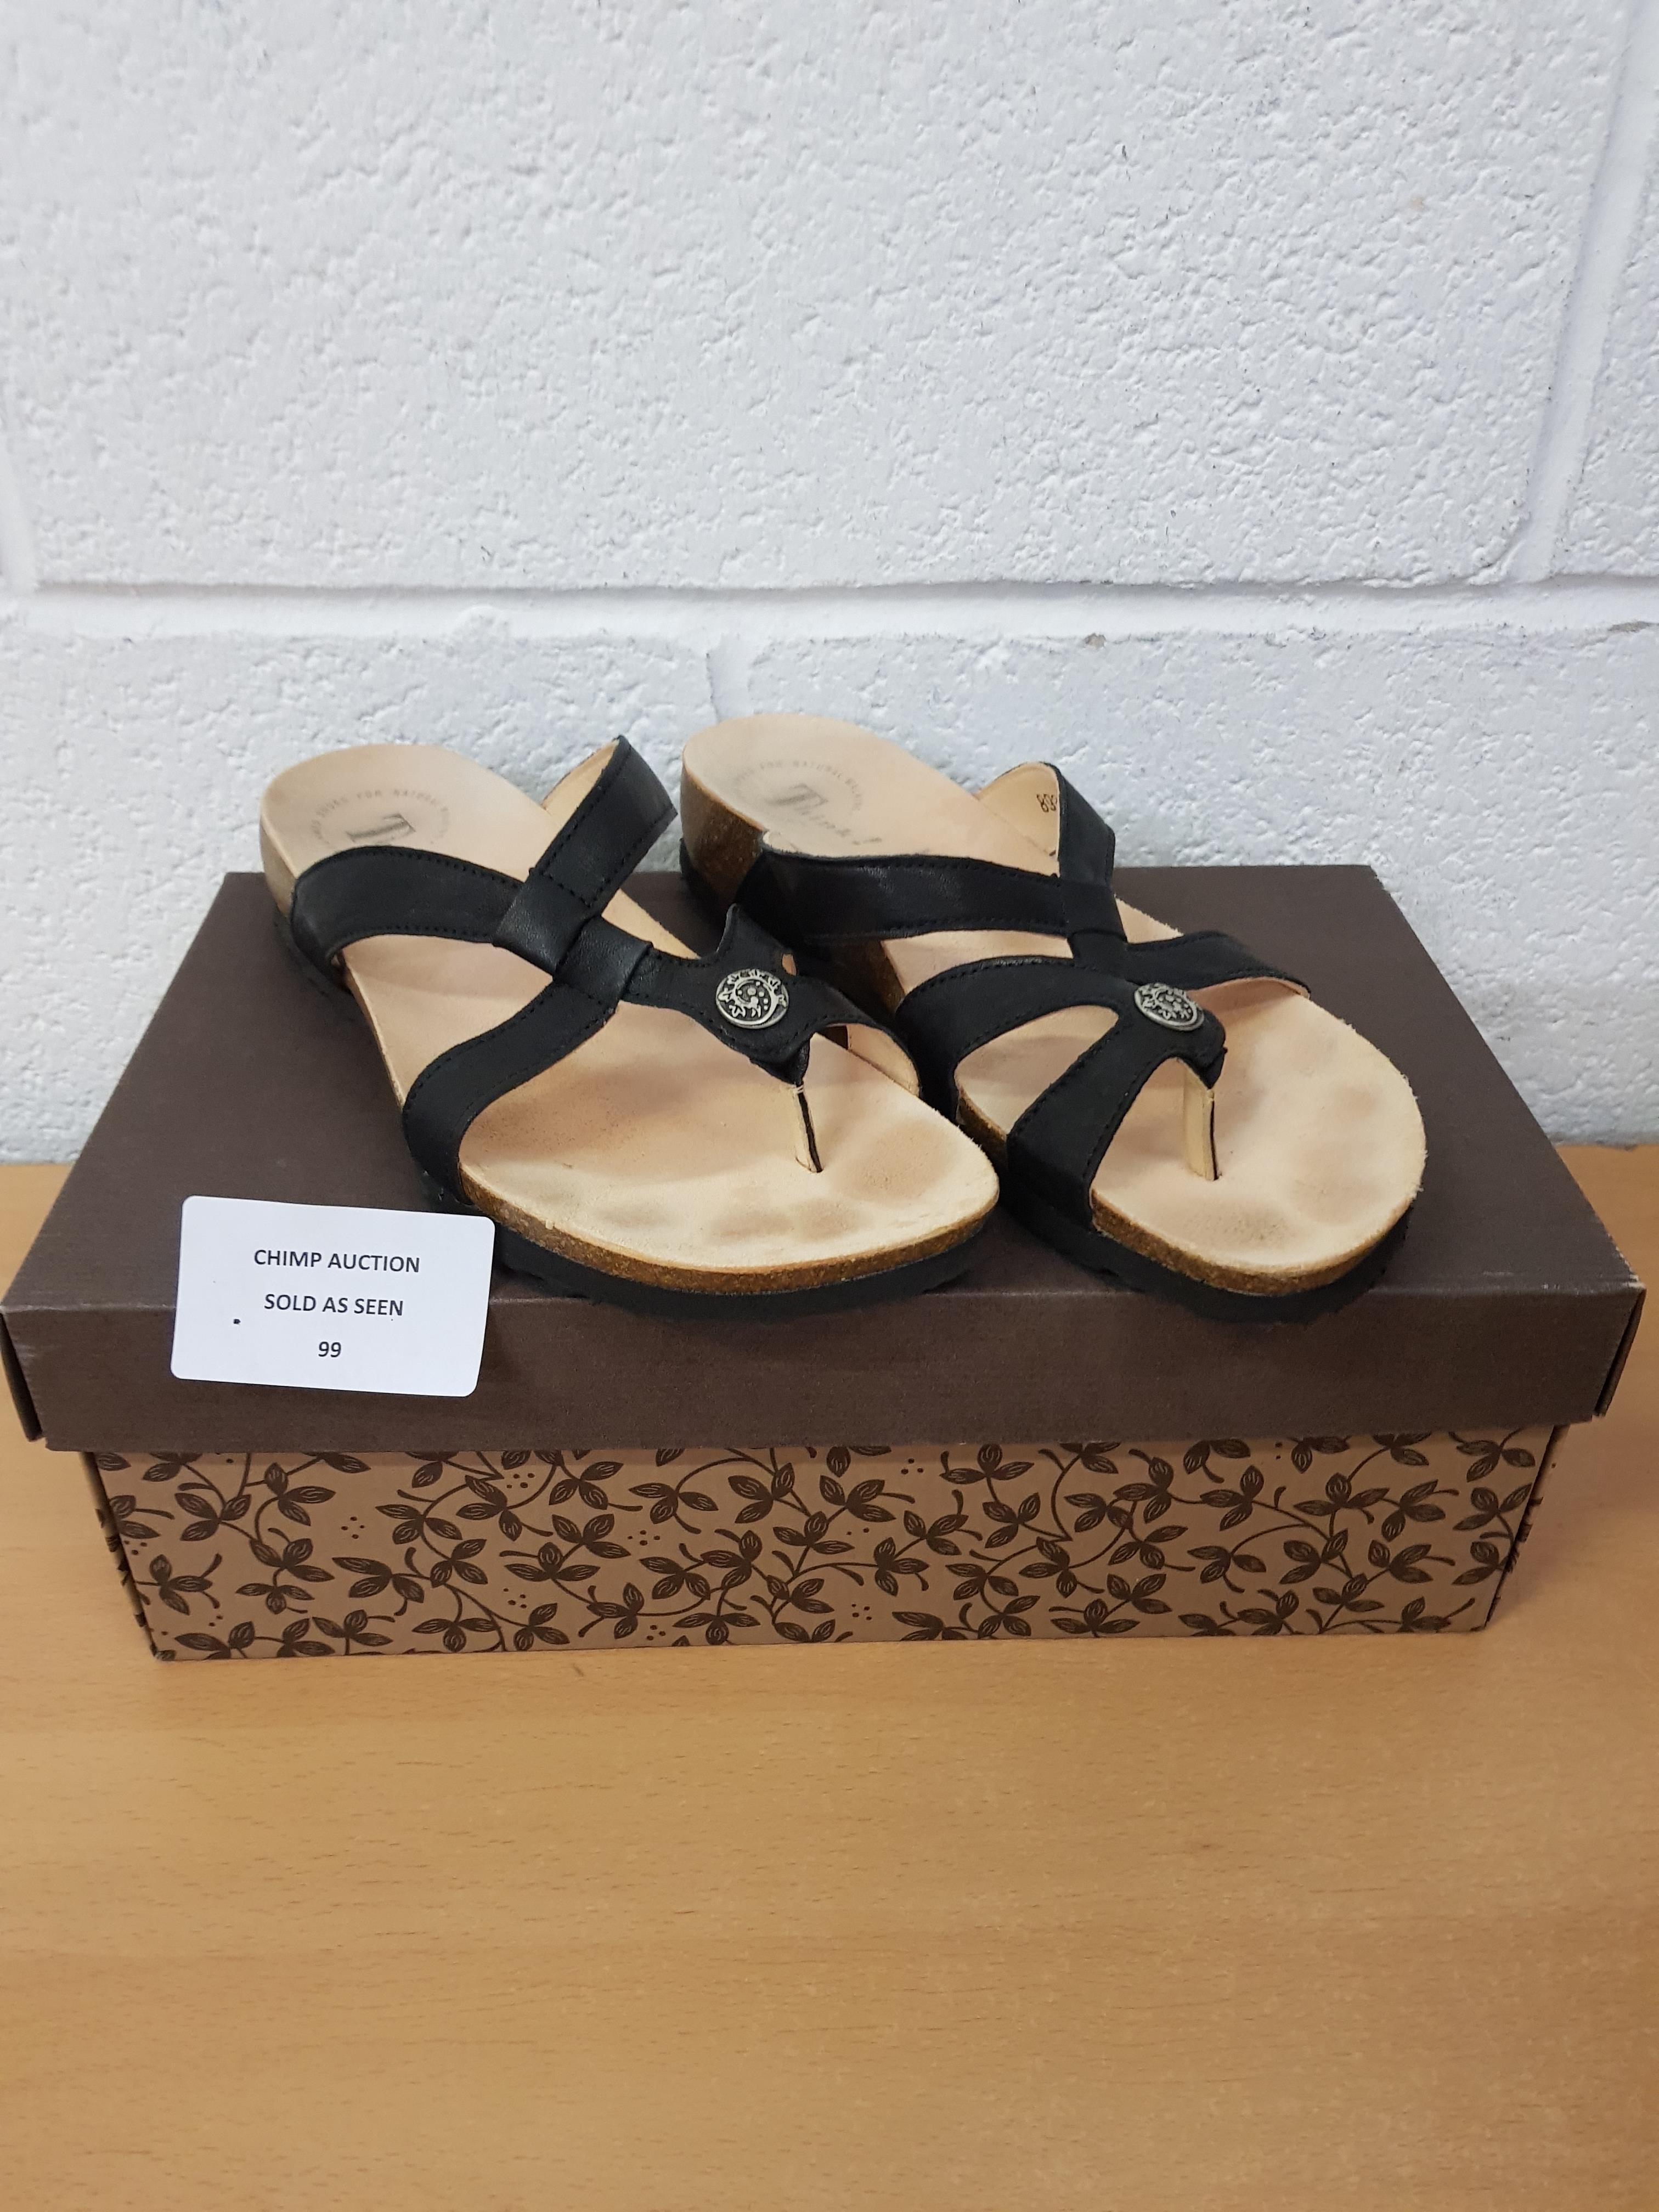 Lot 99 - Think! Ladies sandals EU 40